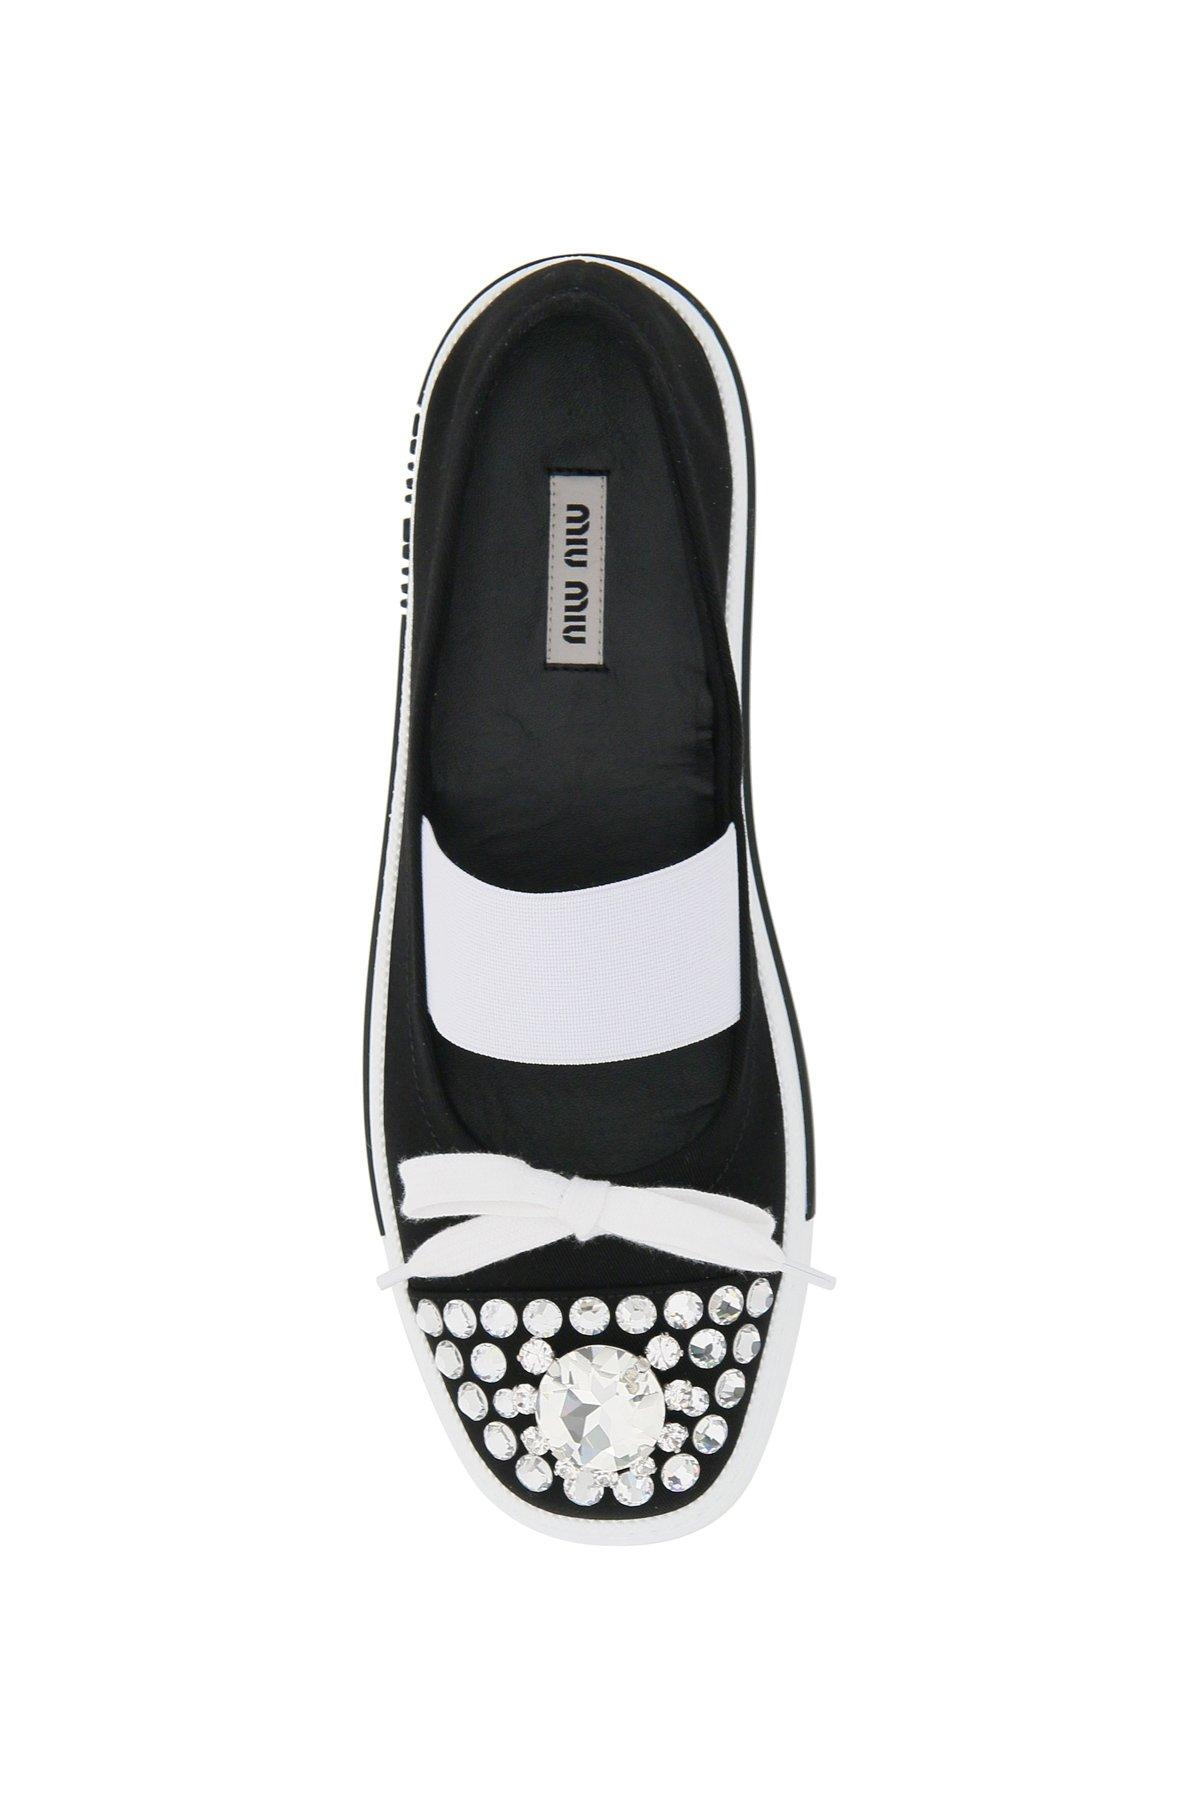 Miu miu sneakers ballerine crystal gabardine